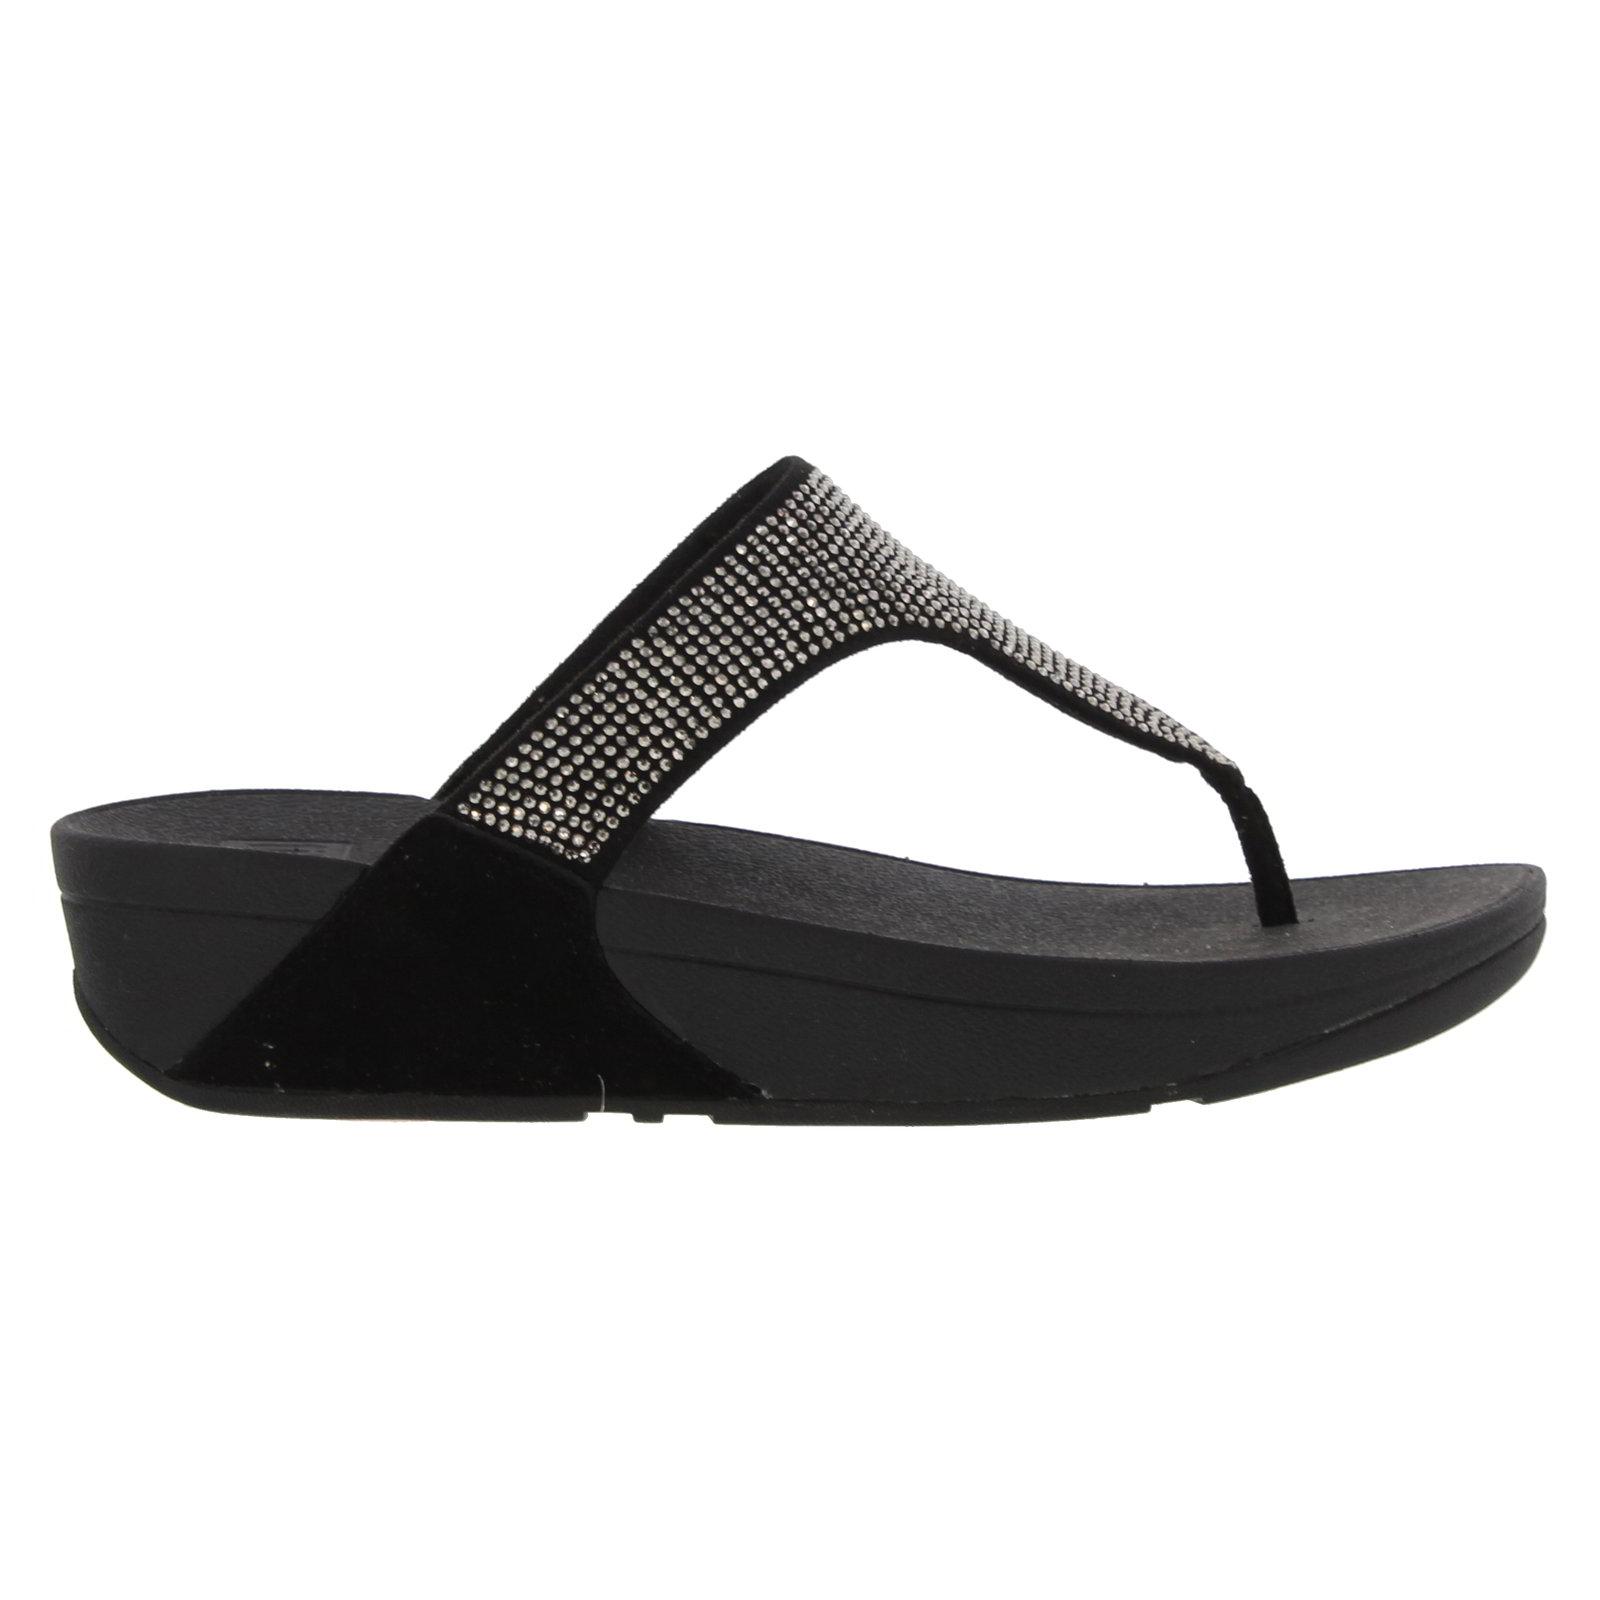 c47a67031 Details about Fitflop Slinky Rokkit Toe Post Sandals Womens Flip Flop Black  Navy Silver UK 4-8